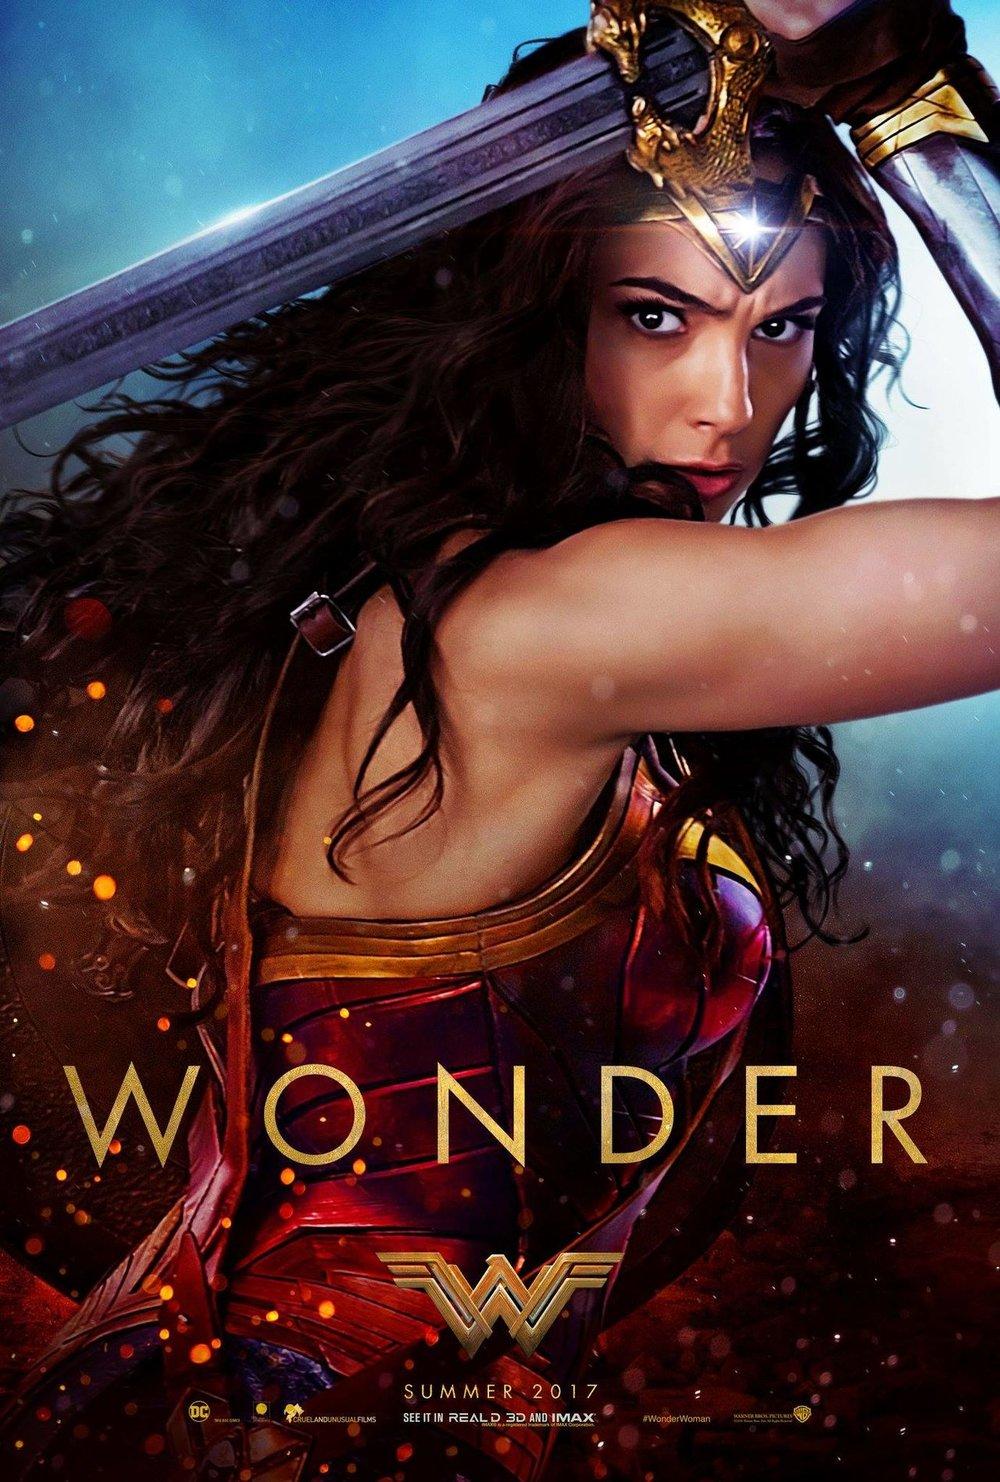 Wonder_Woman-poster_1_0.jpg